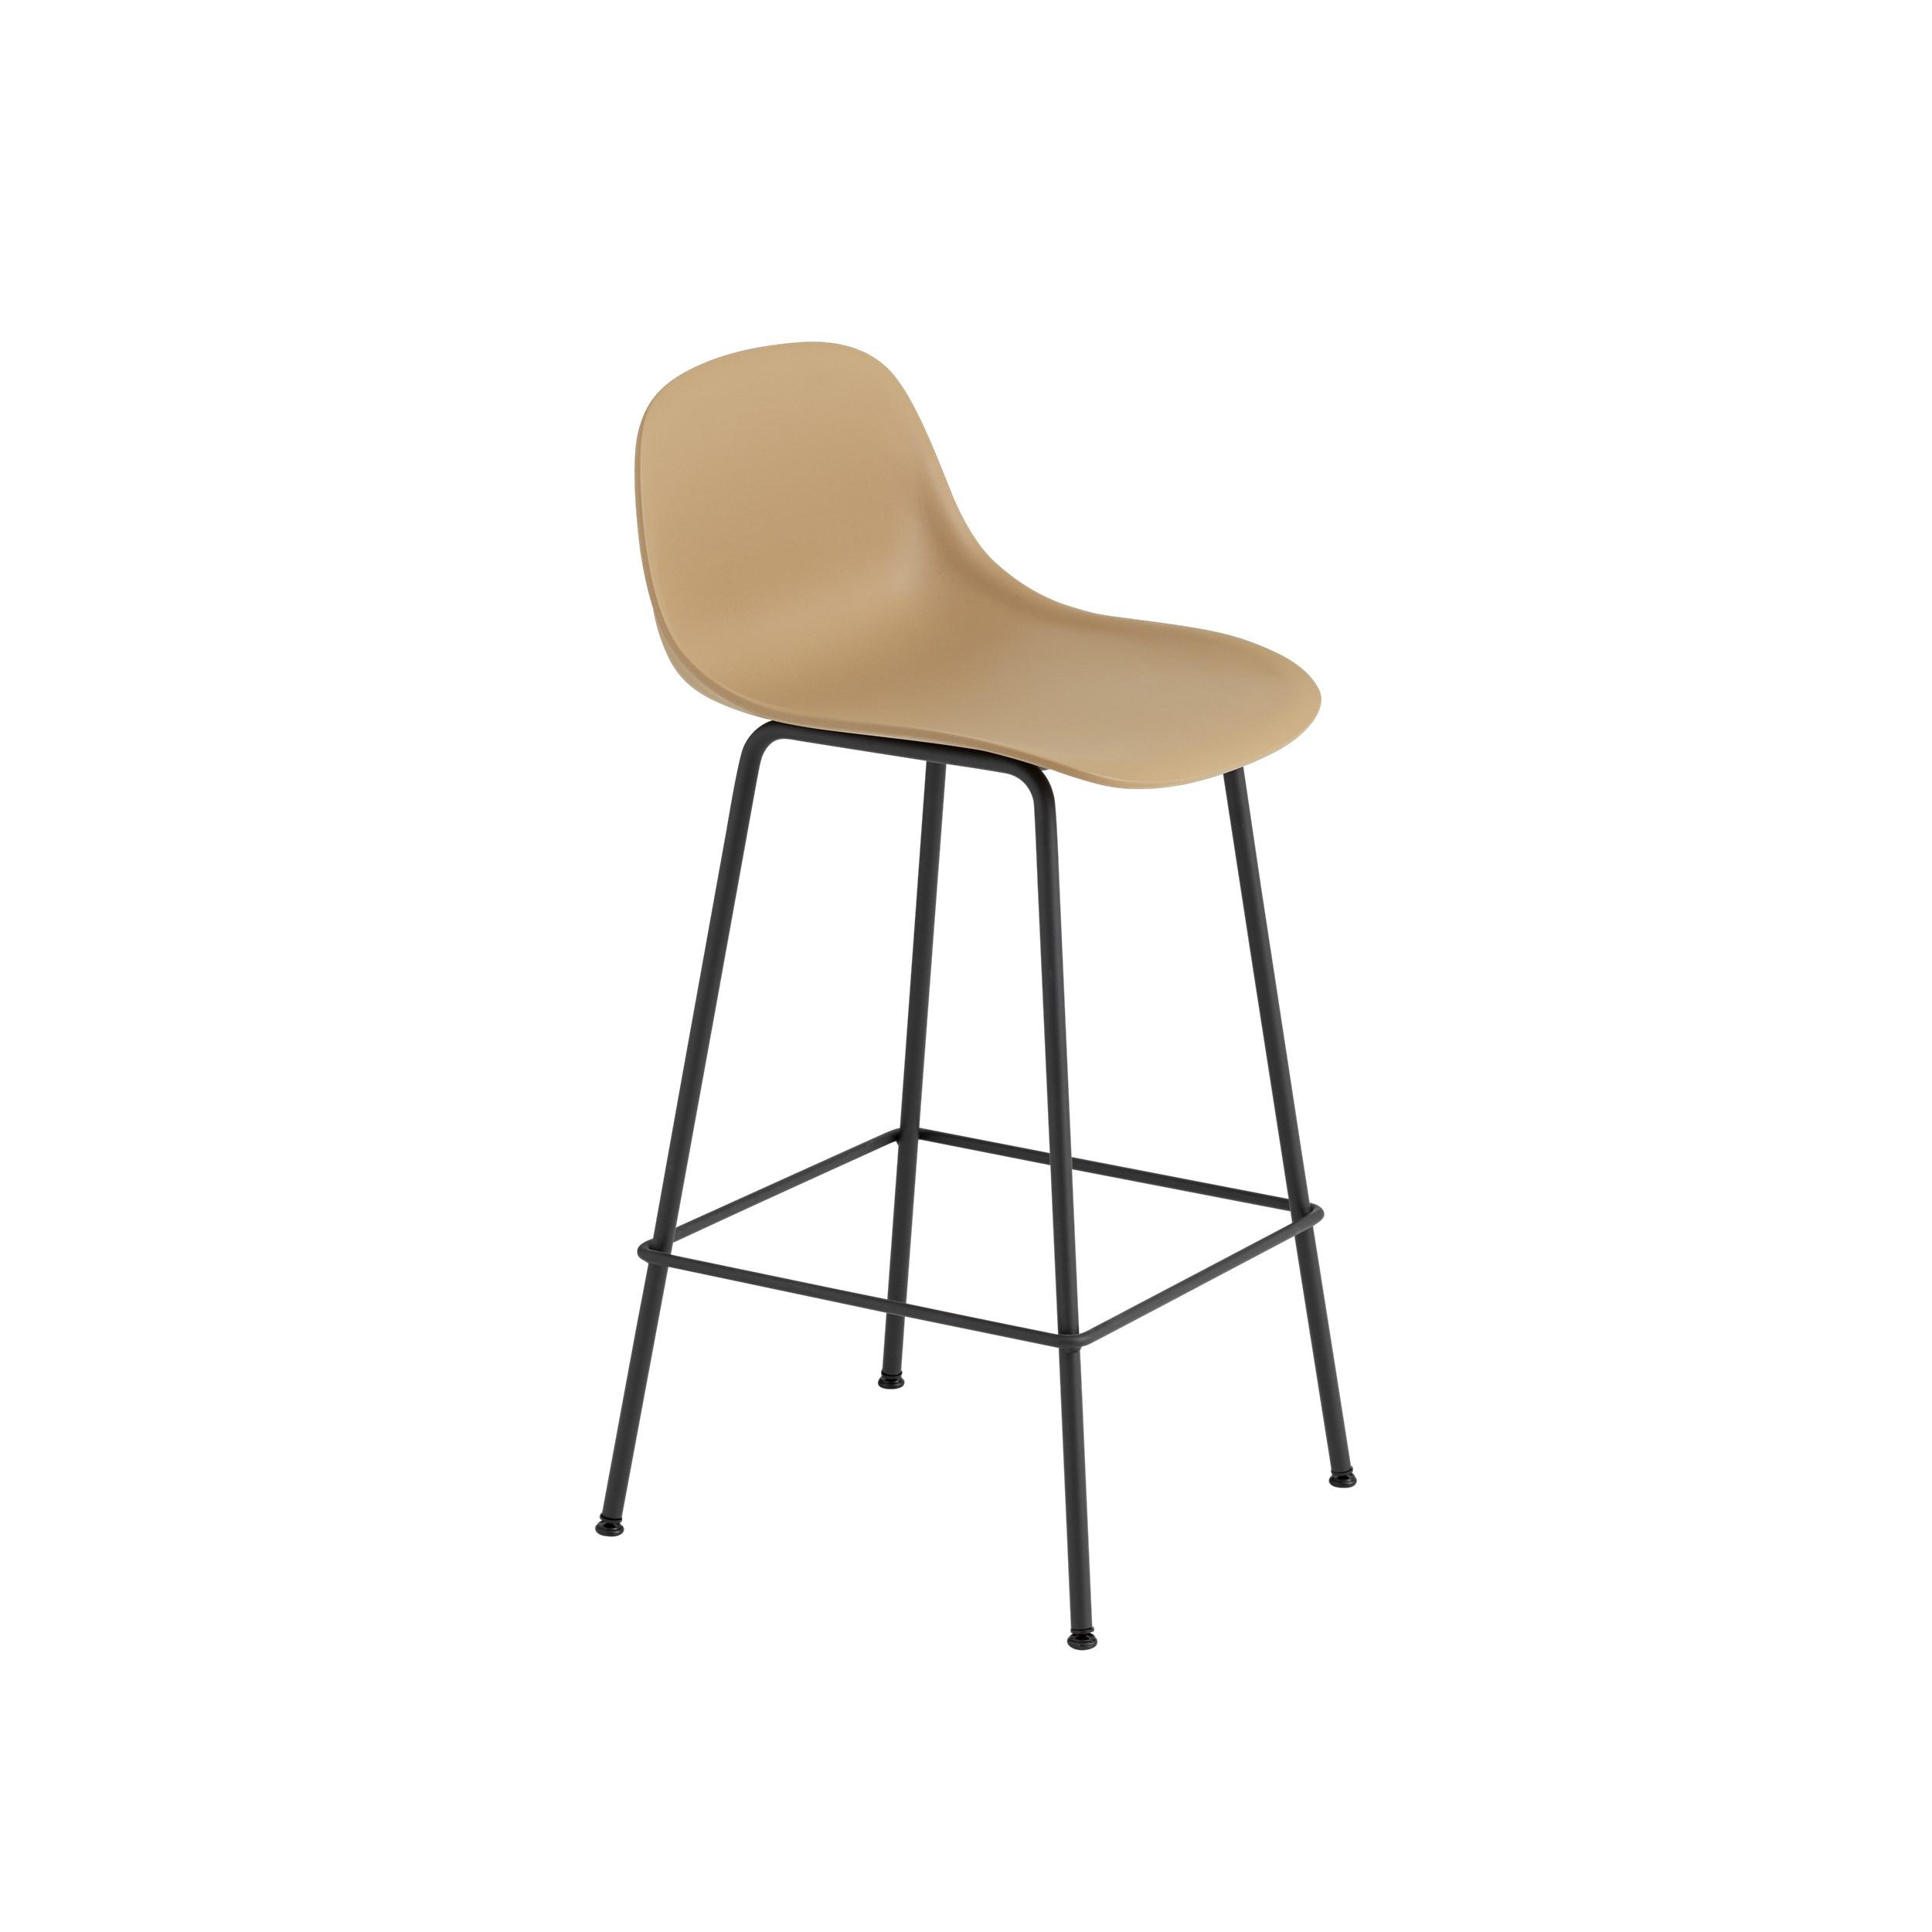 Fiber bar stool with backrest, tube base